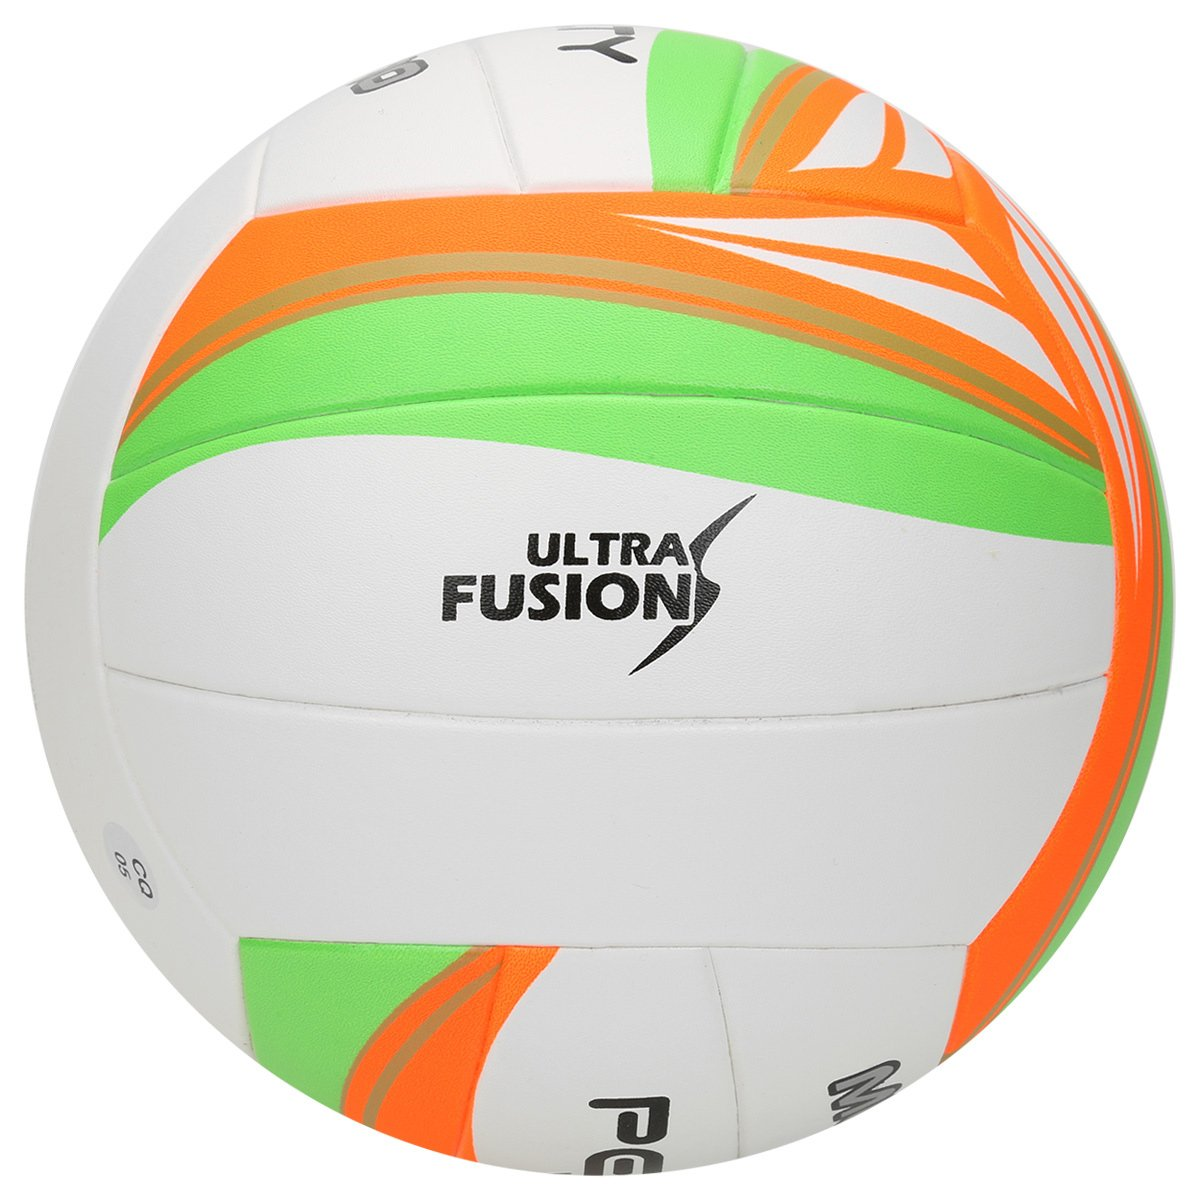 Bola Vôlei Penalty MG 2500 Ultra Fusion VII - Branco e Laranja ... b6d163f6105bb